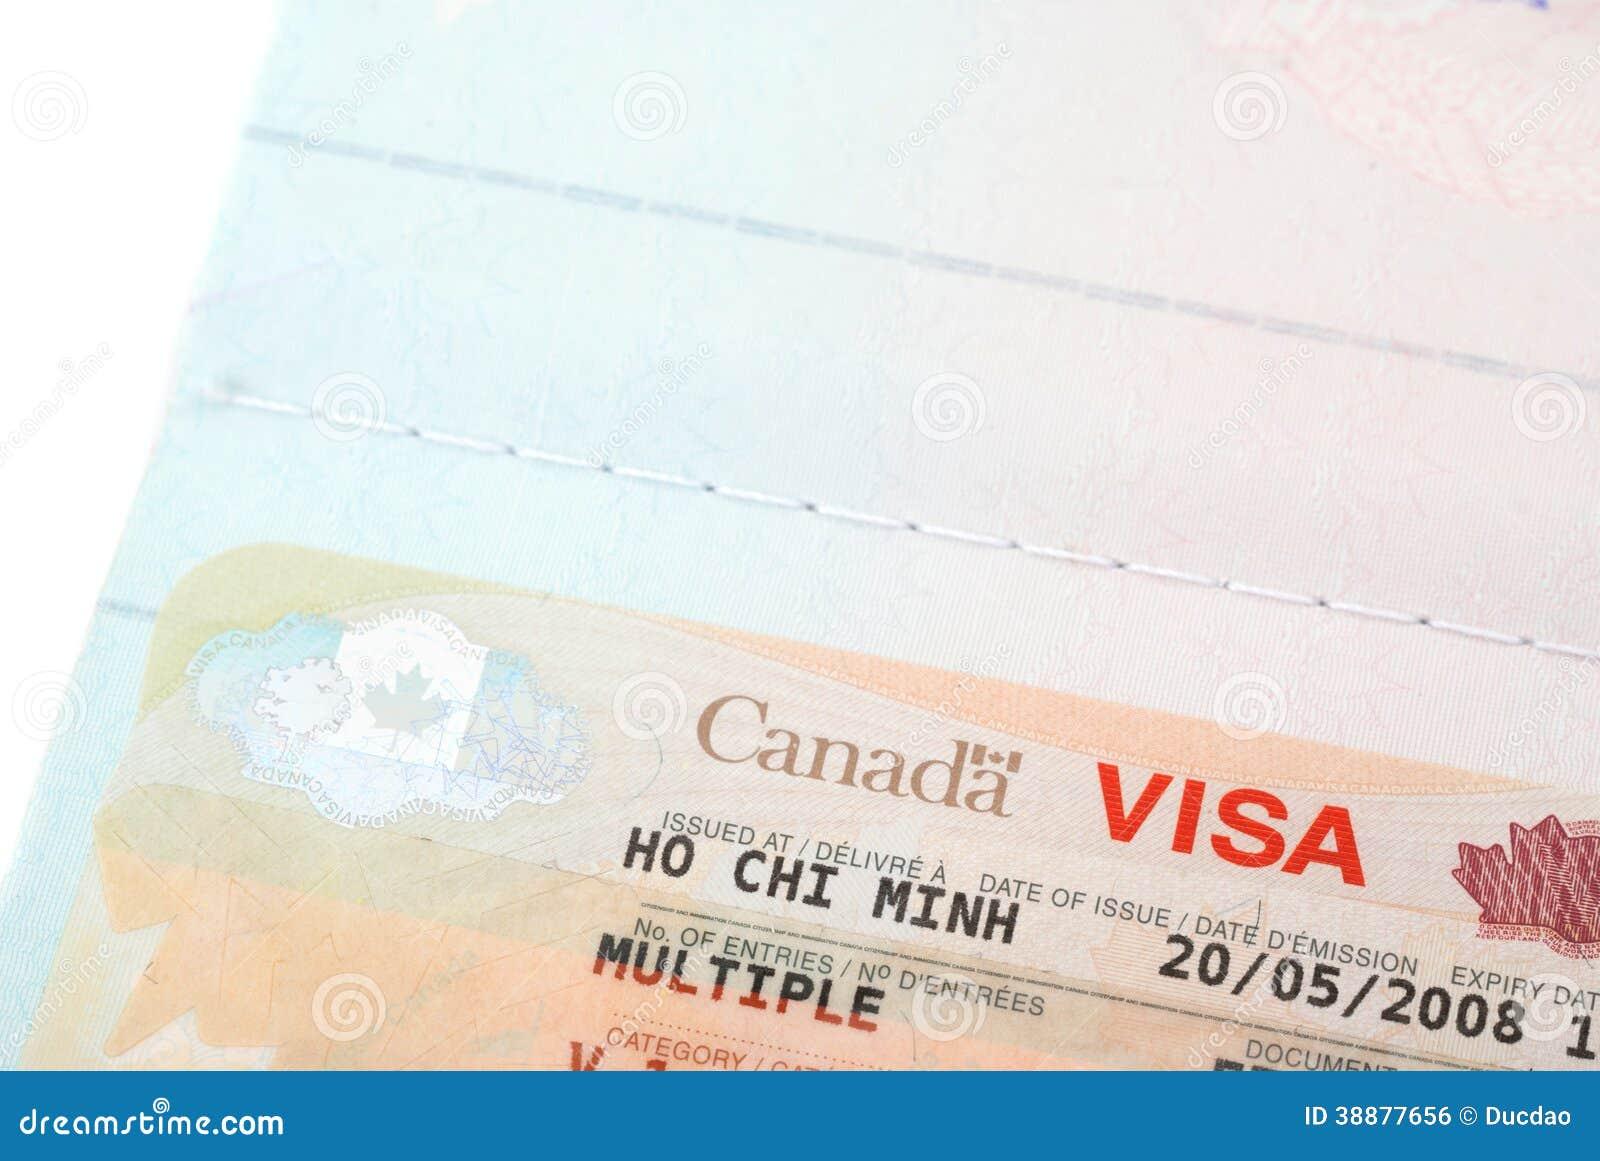 Close Up Shot Of Canadian Visa Stamp Stock Photo - Image of airport